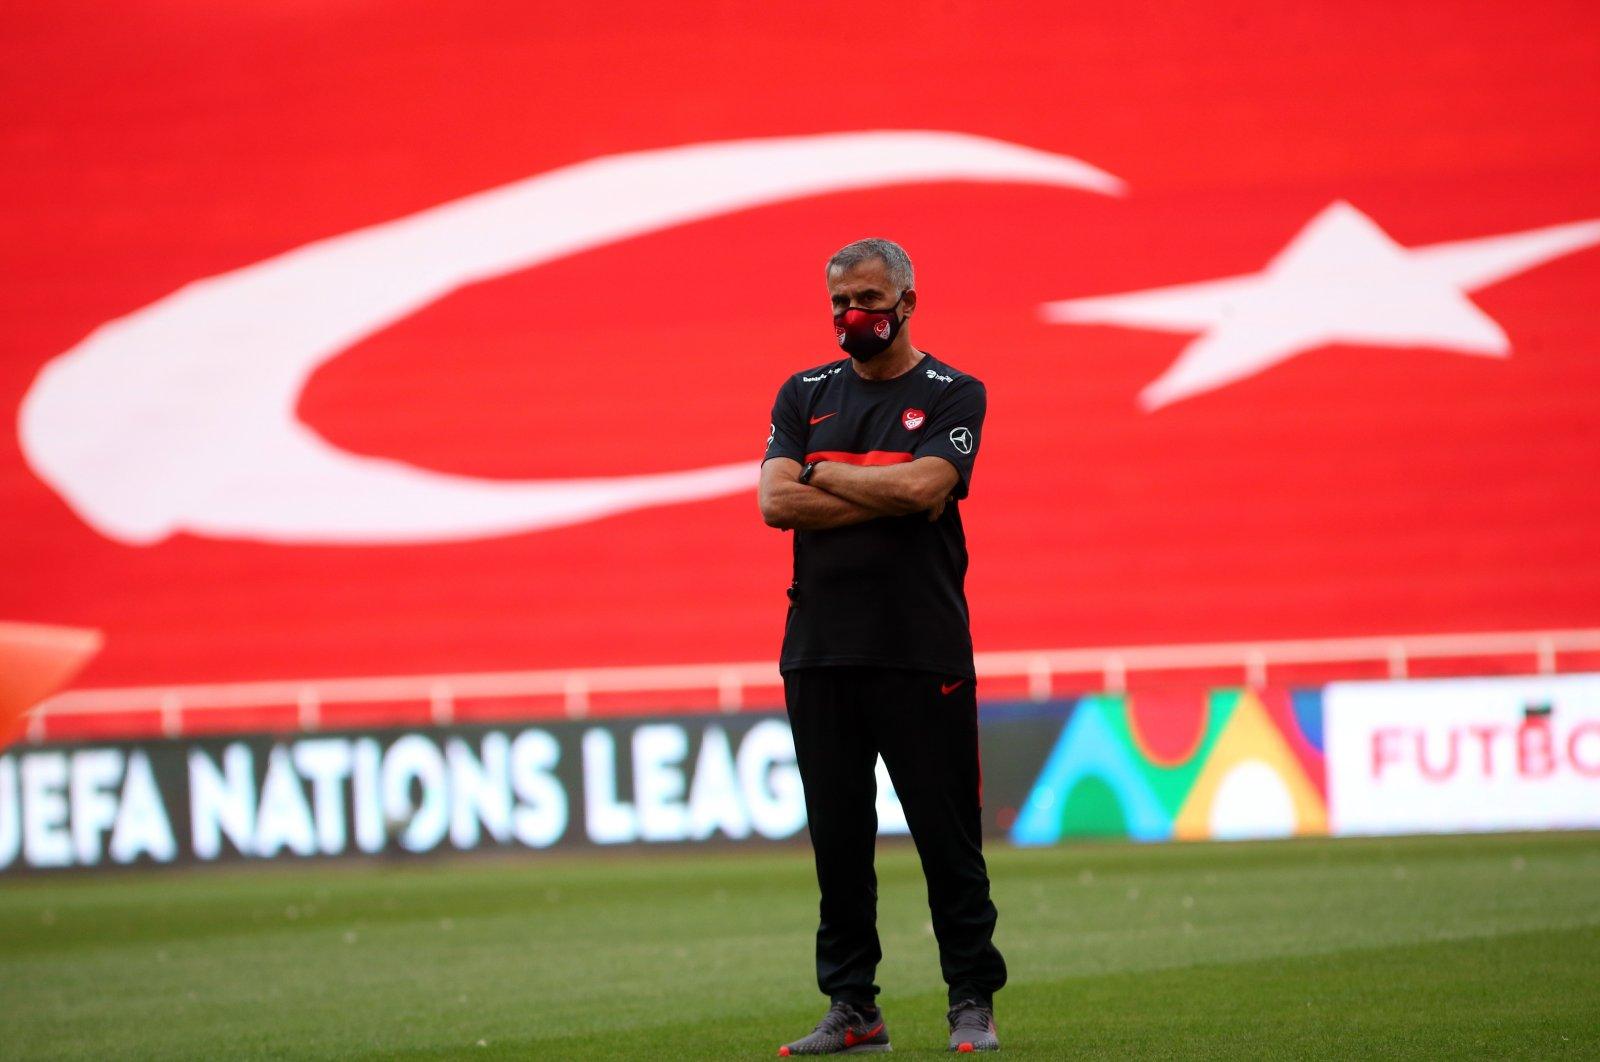 Turkish national team coach Şenol Güneş oversees a training session in Izmir, southwestern Turkey, May 14, 2021. (IHA Photo)